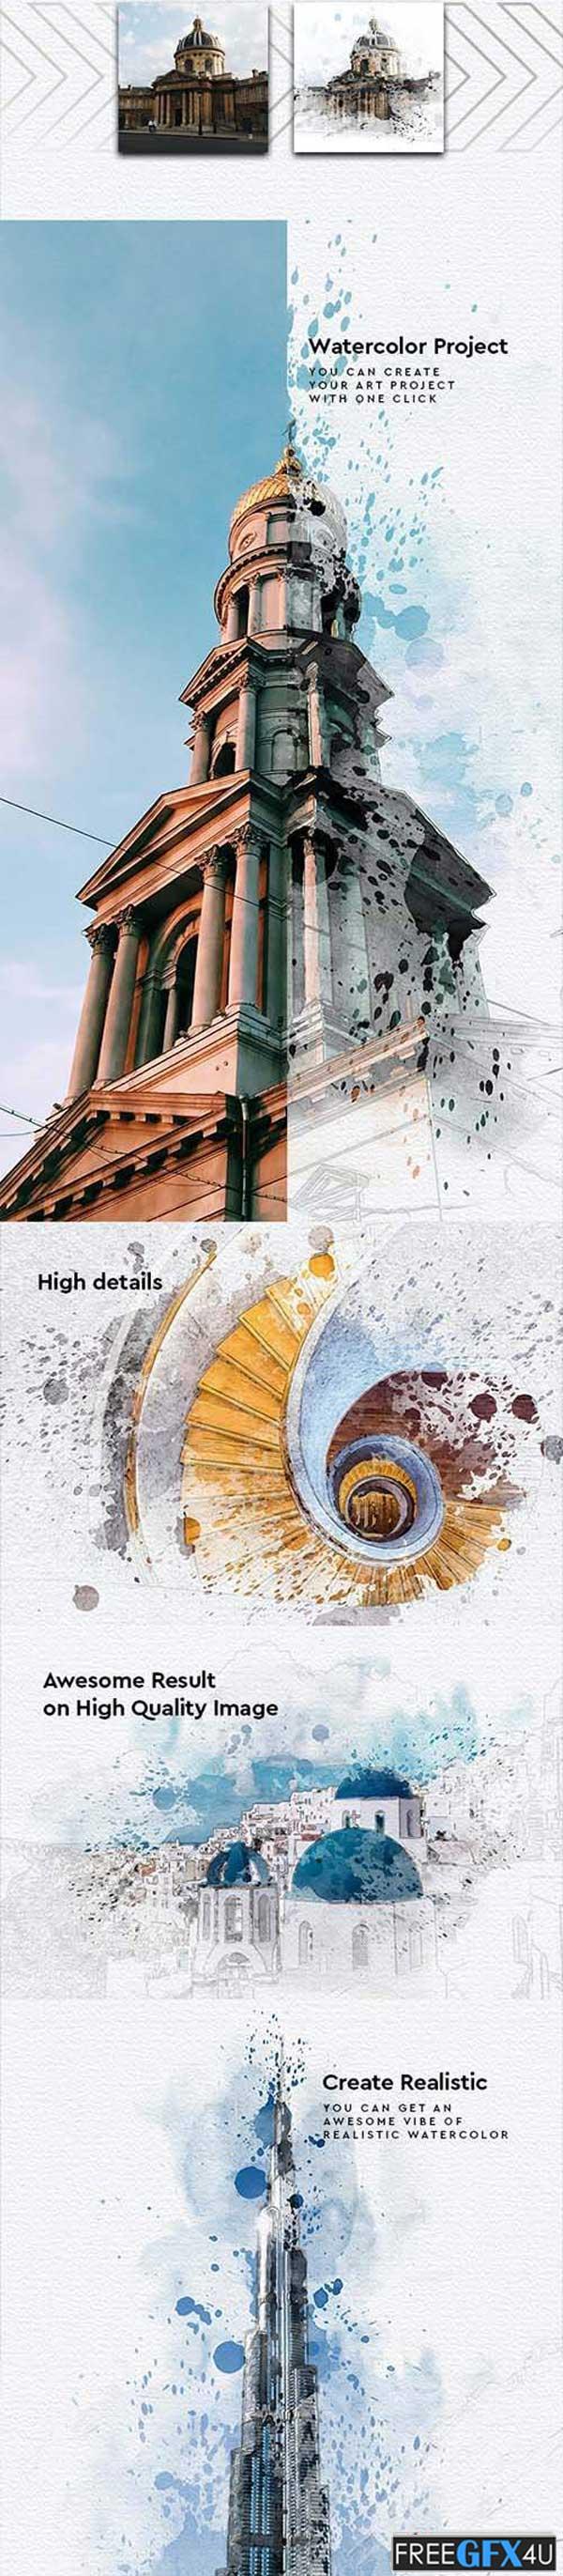 Watercolor Project Architecture Photoshop Action